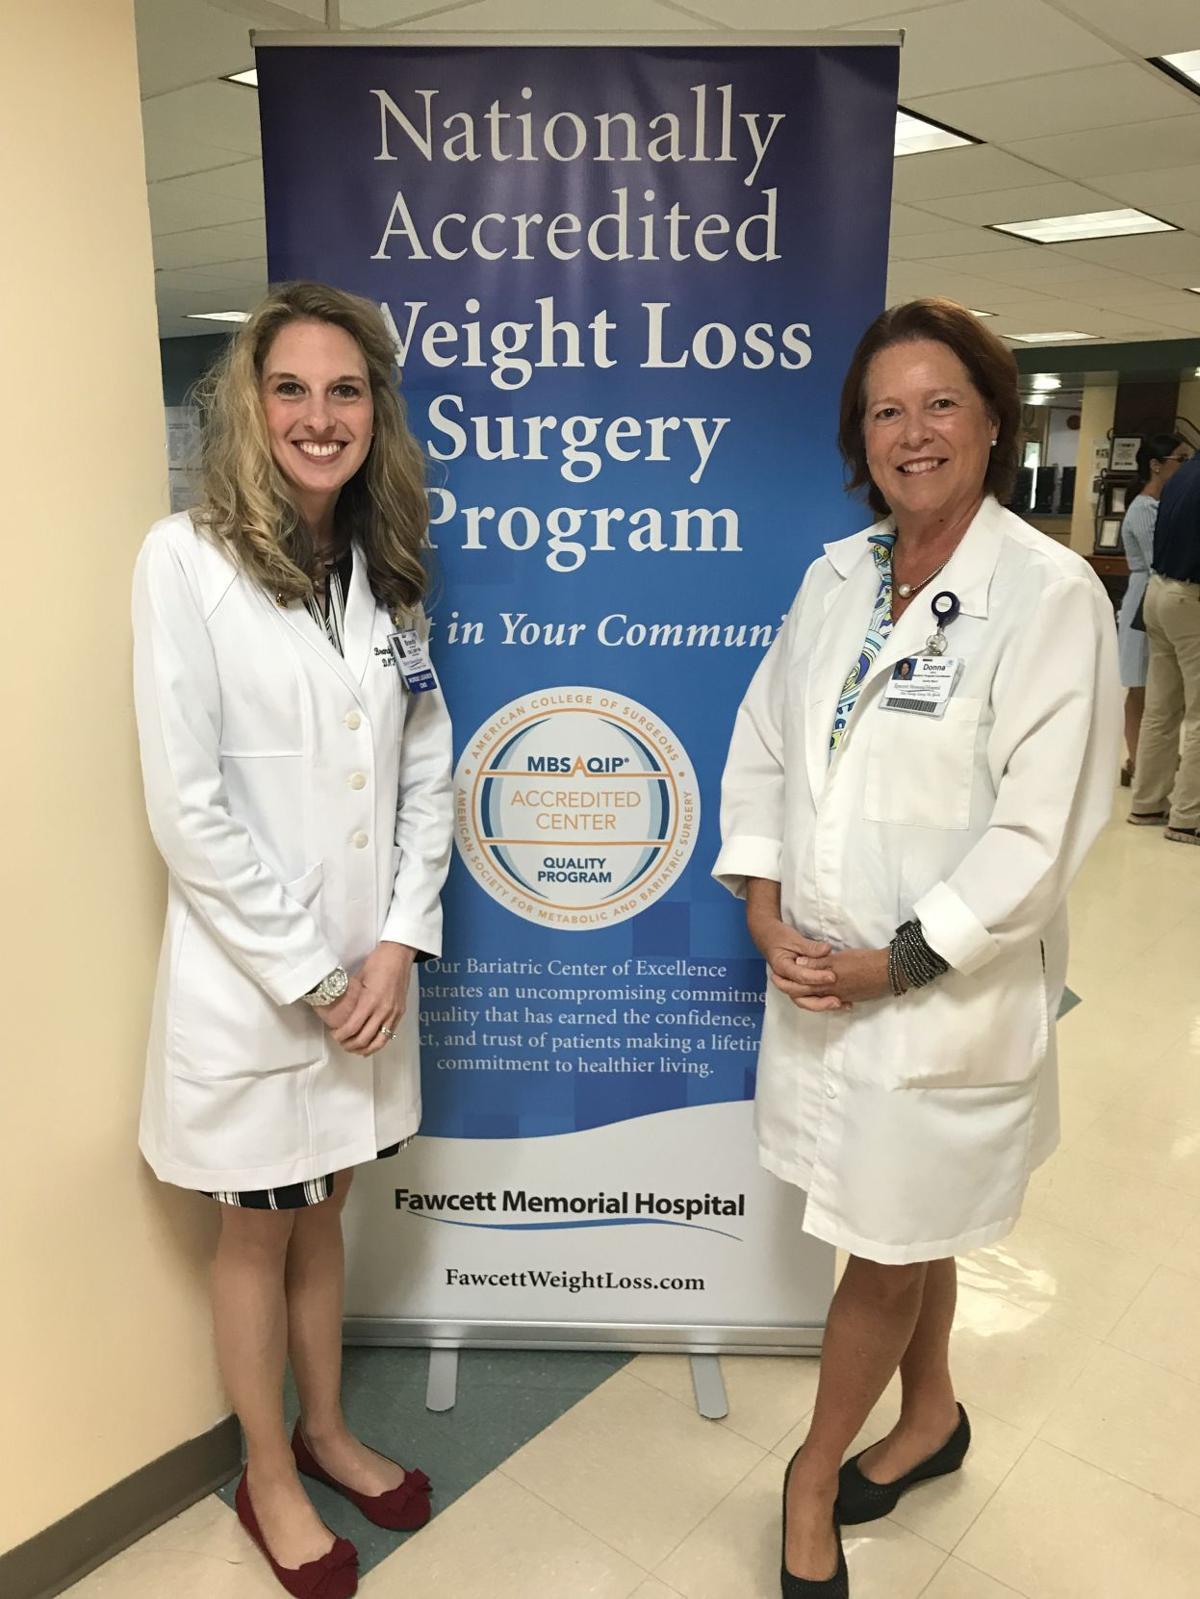 Fawcett Memorial Hospital Celebrates Weight Loss Surgery